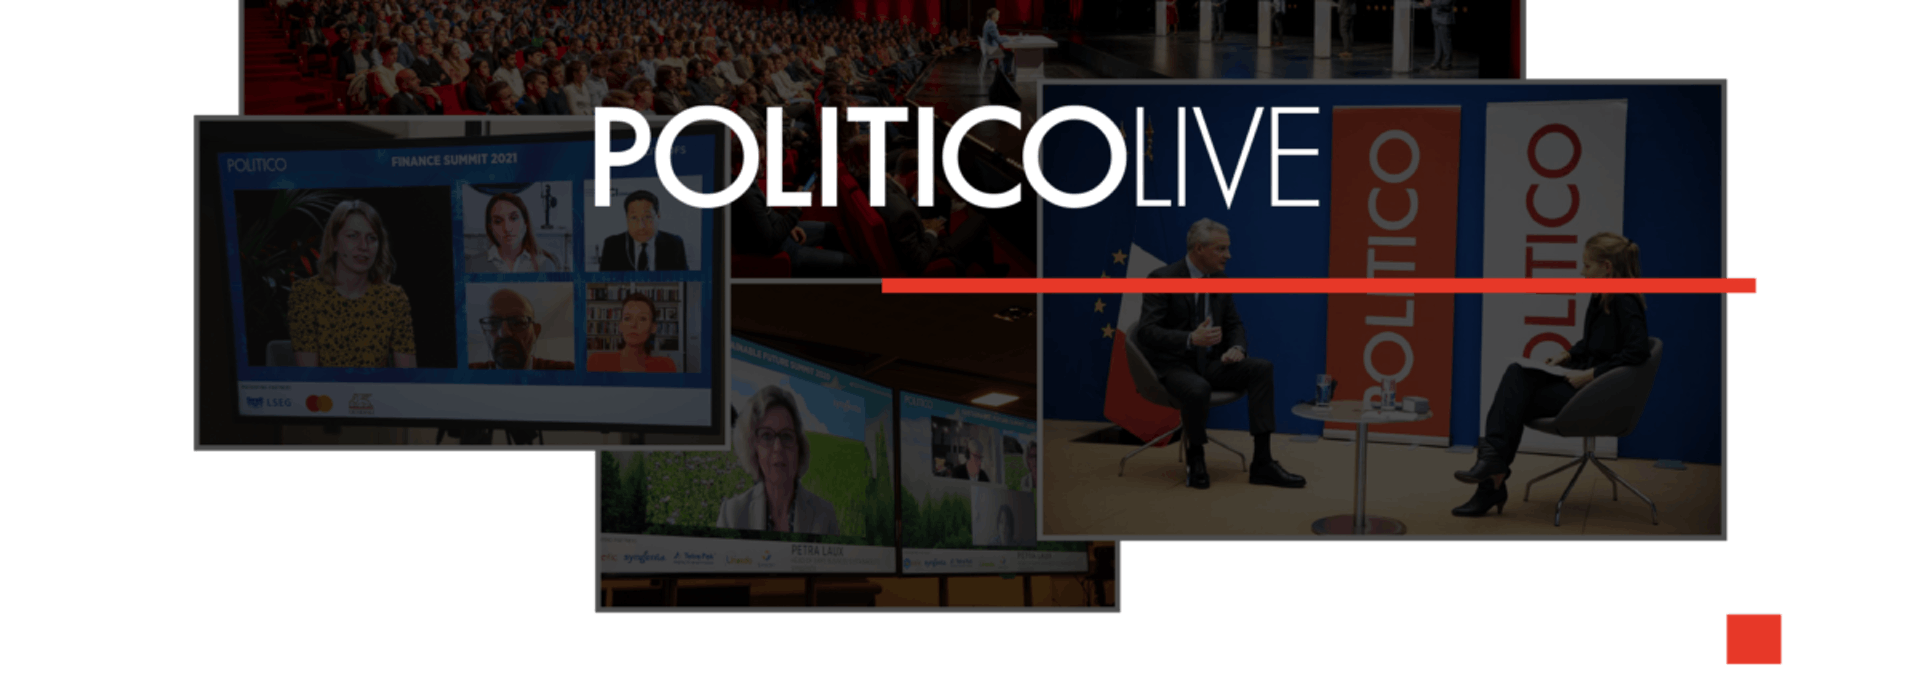 POLITICO'S Competitive Europe Summit